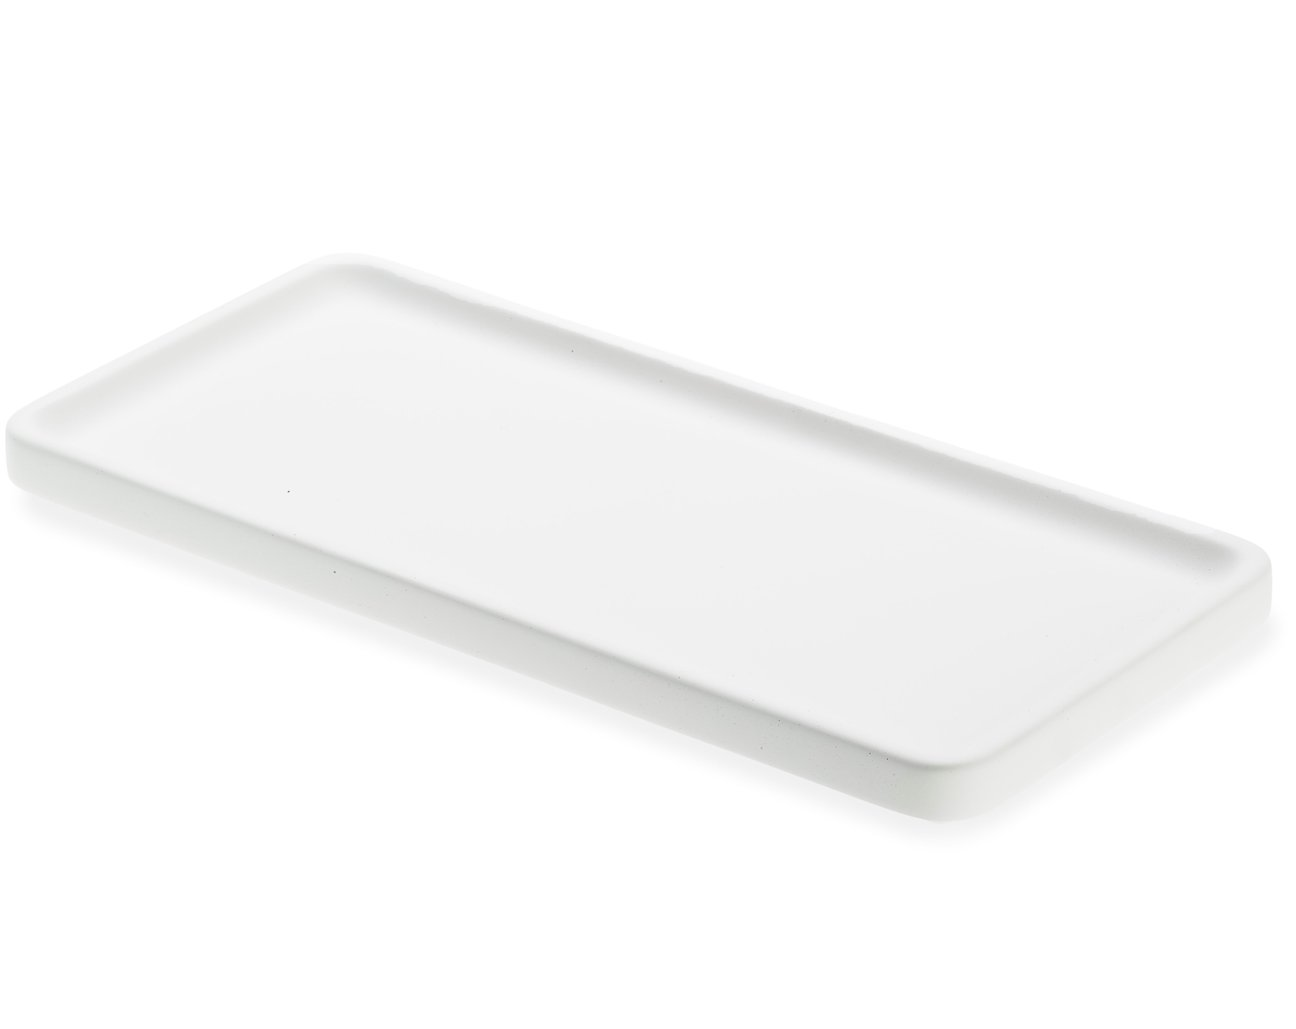 LIKEconcrete - Karin Tray Small 30 x 14 x 2 cm - White (93765)